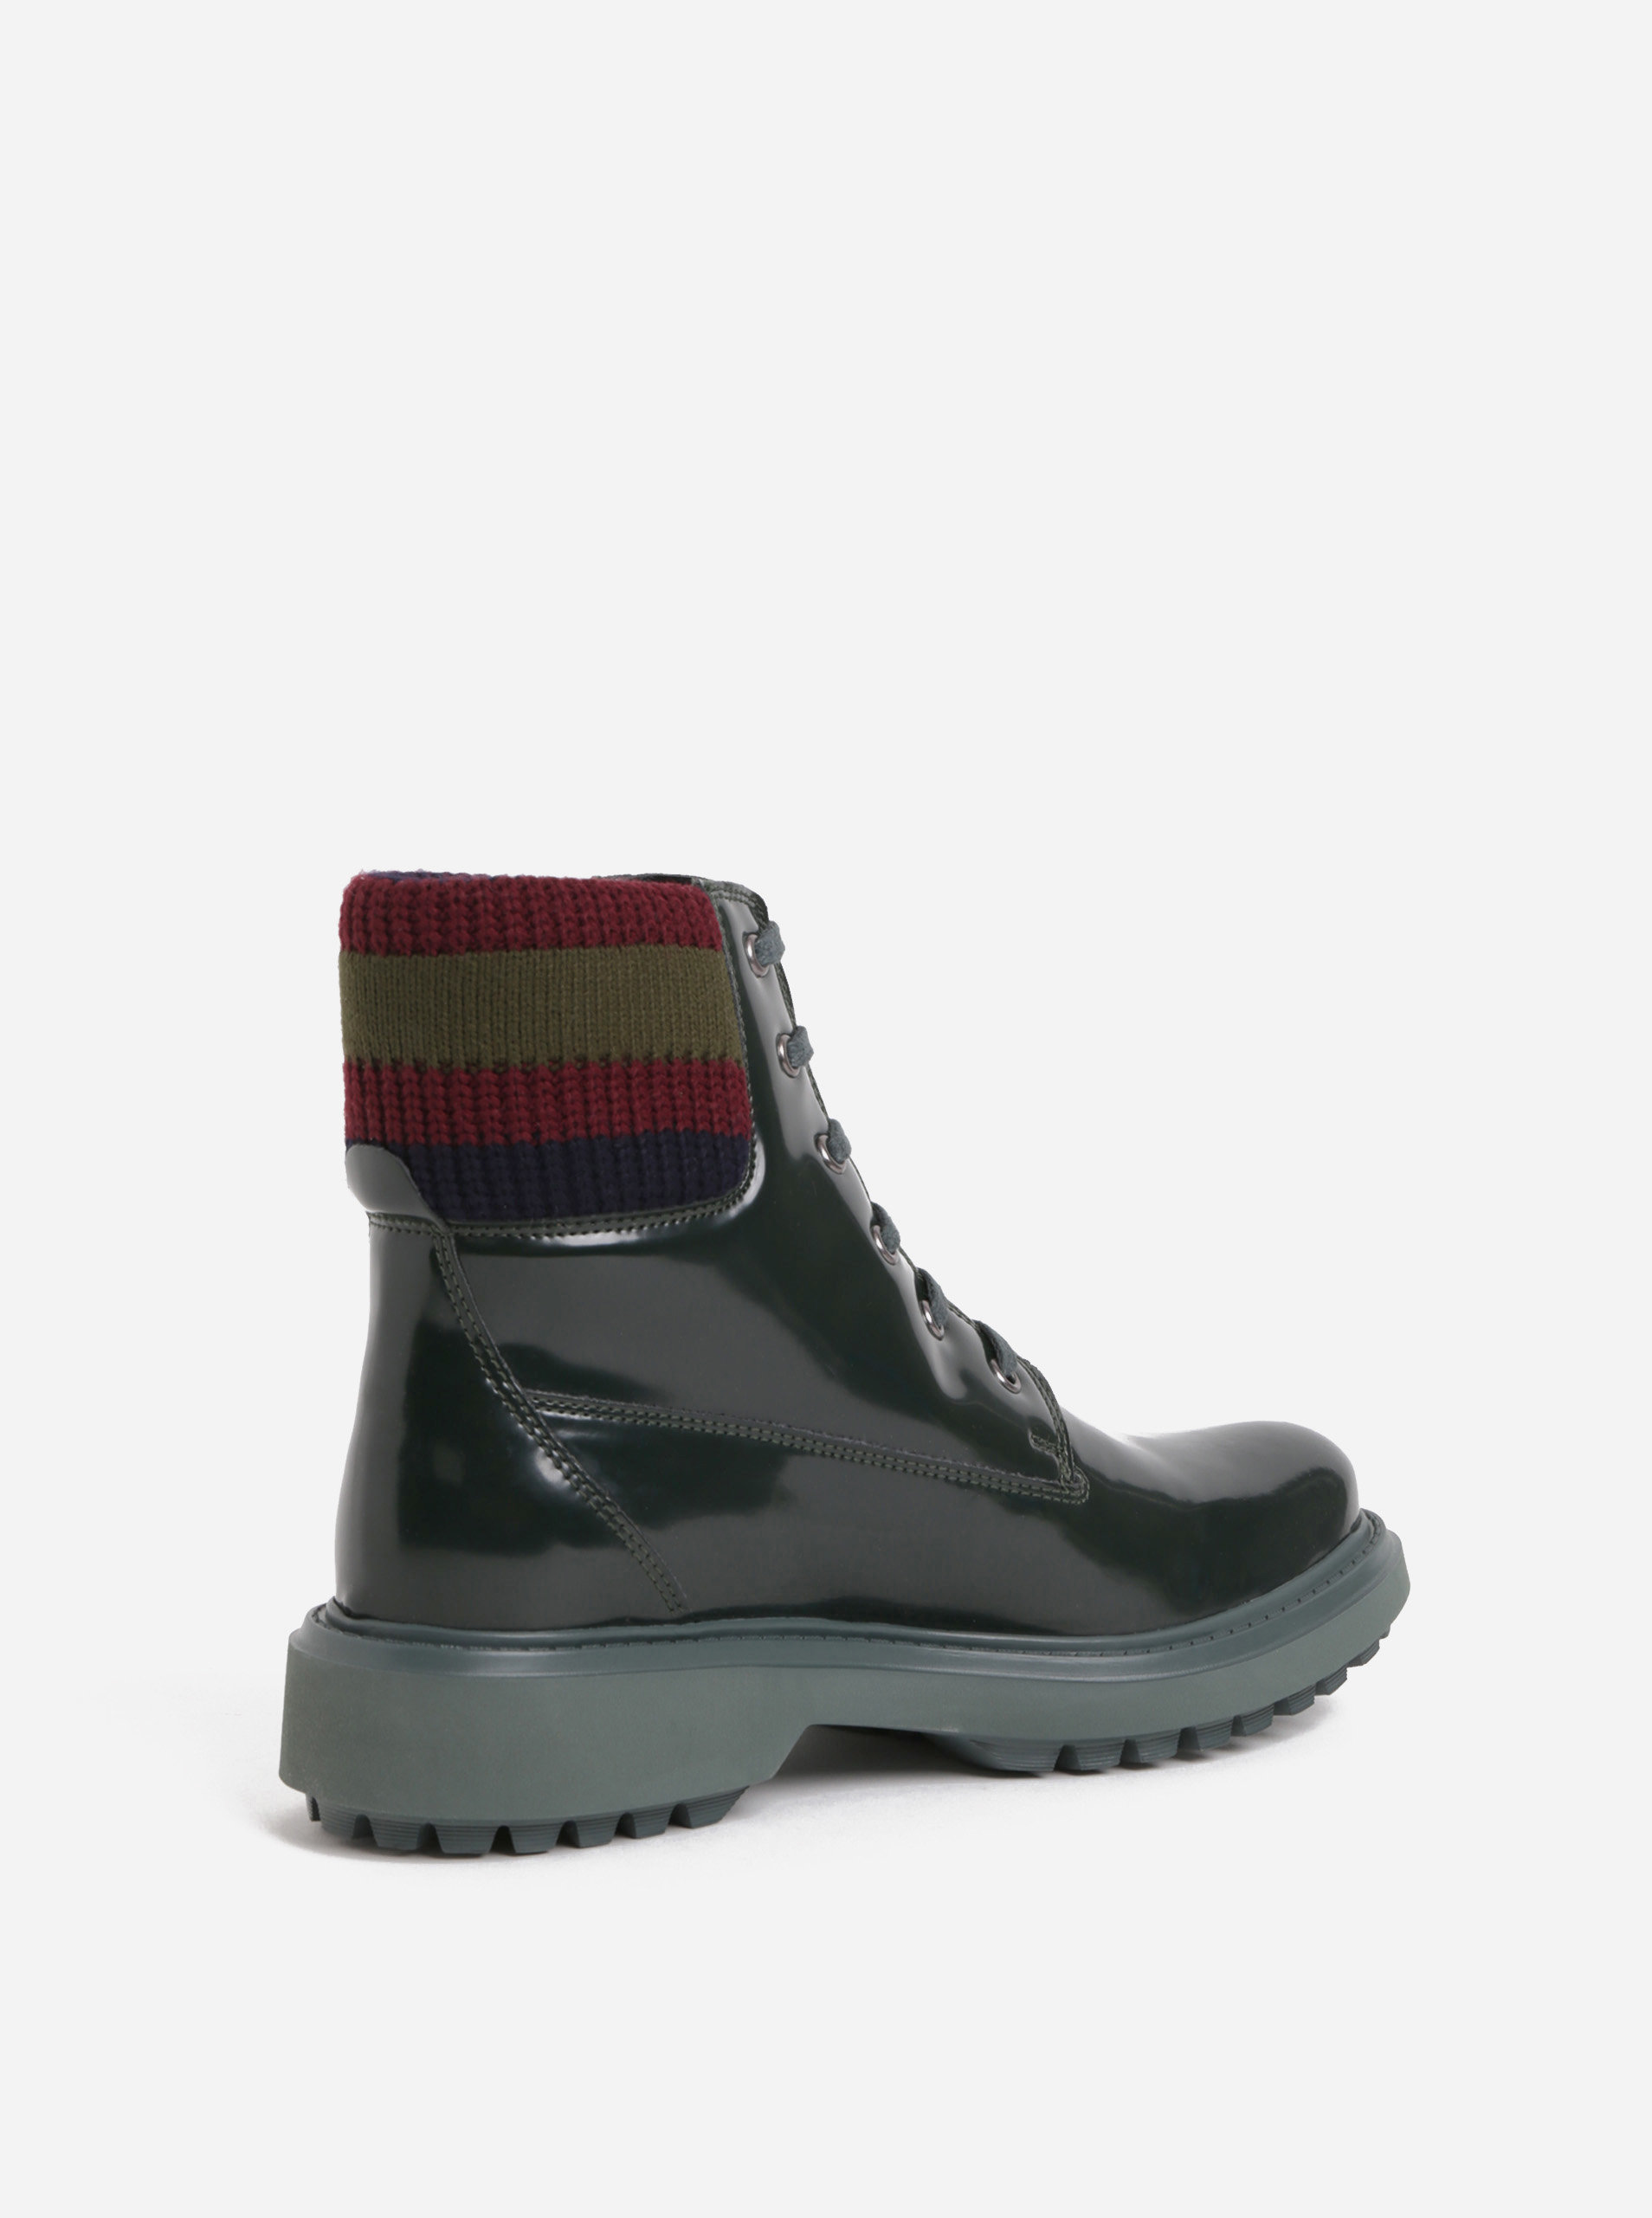 fe8175cd9a390 Tmavozelené dámske členkové topánky s úpletovým lemom Geox Asheely ...